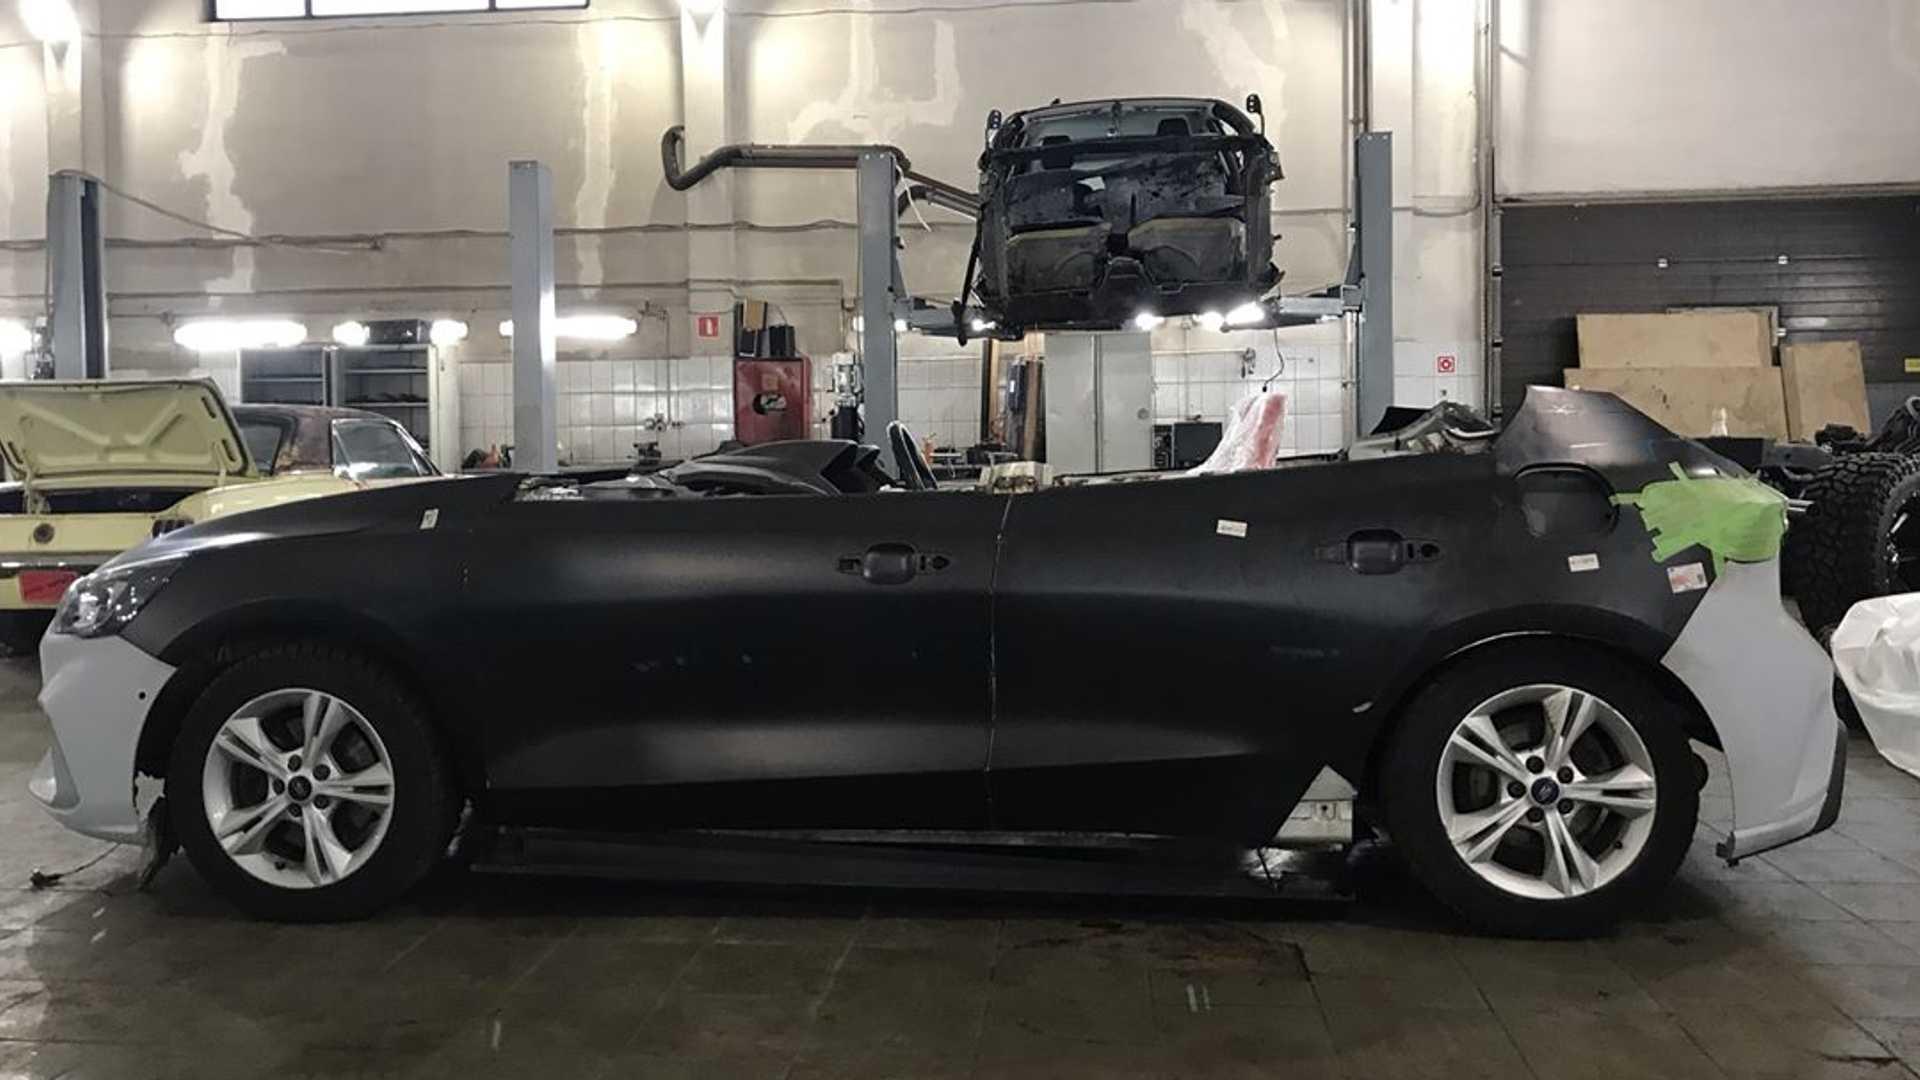 Ford_Focus_speedster_conversion_0018